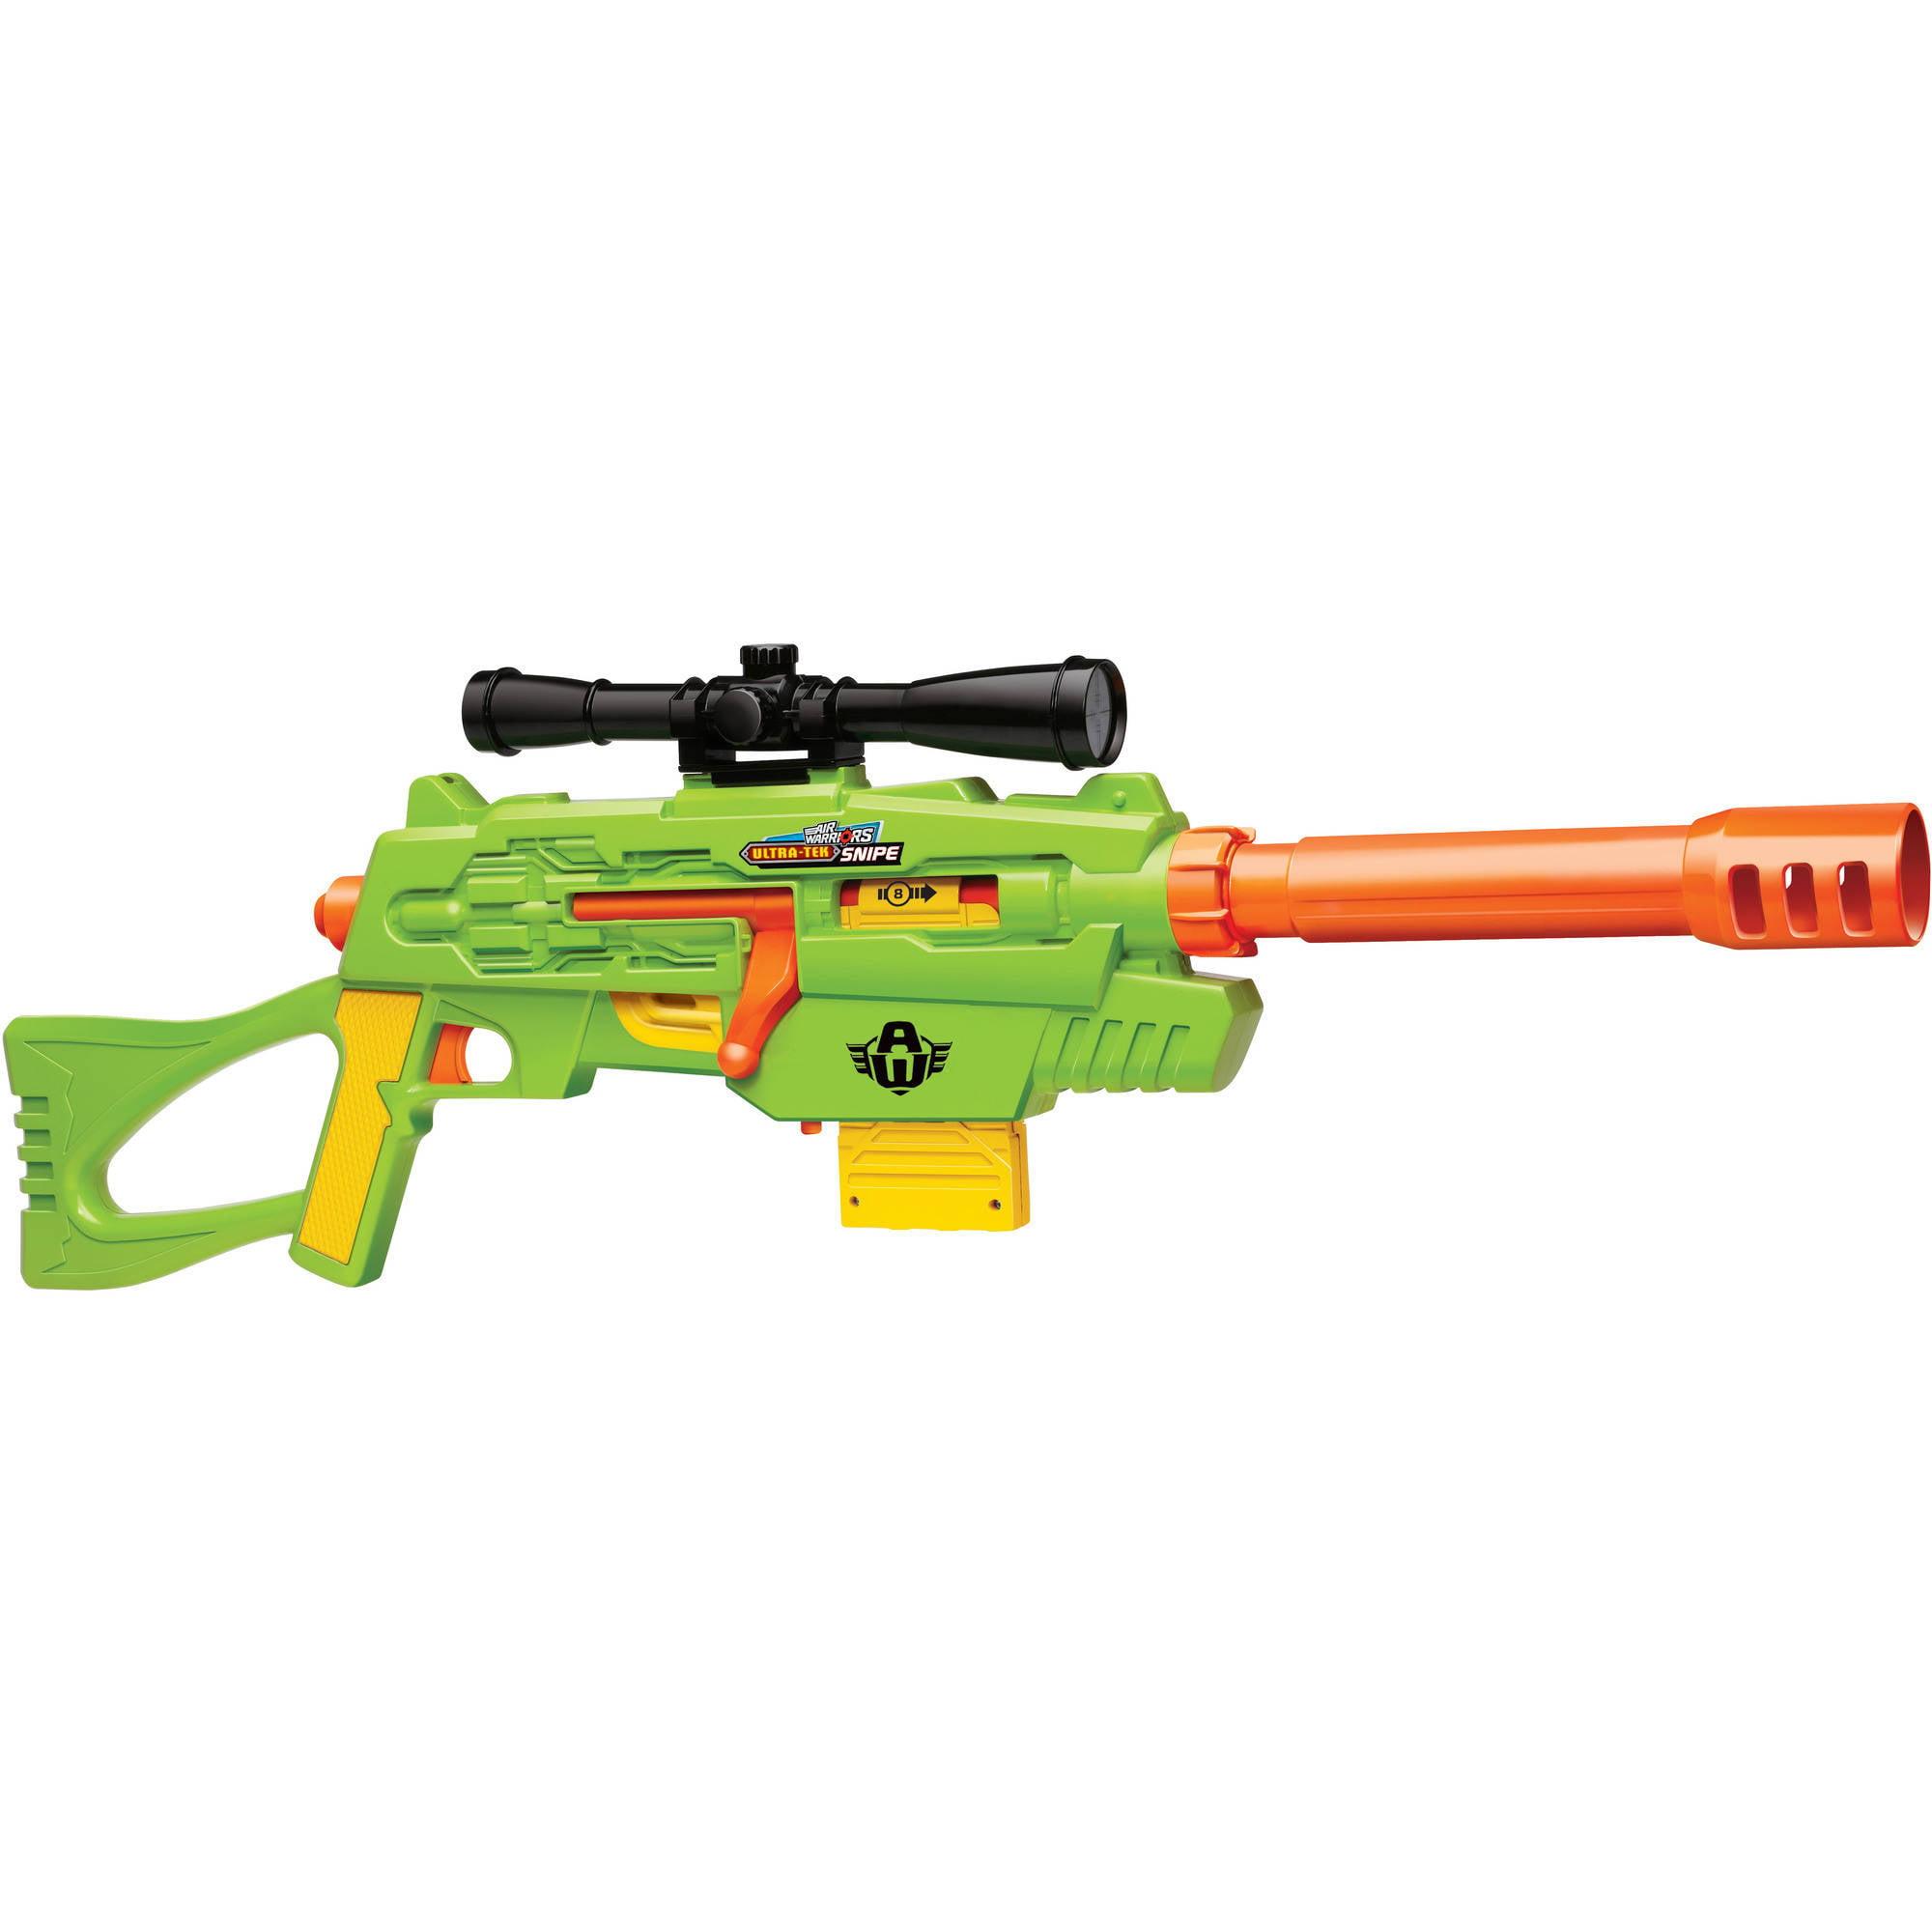 Buzz Bee Toys Air Warriors Ultra Tek Snipe Walmart Com Walmart Com